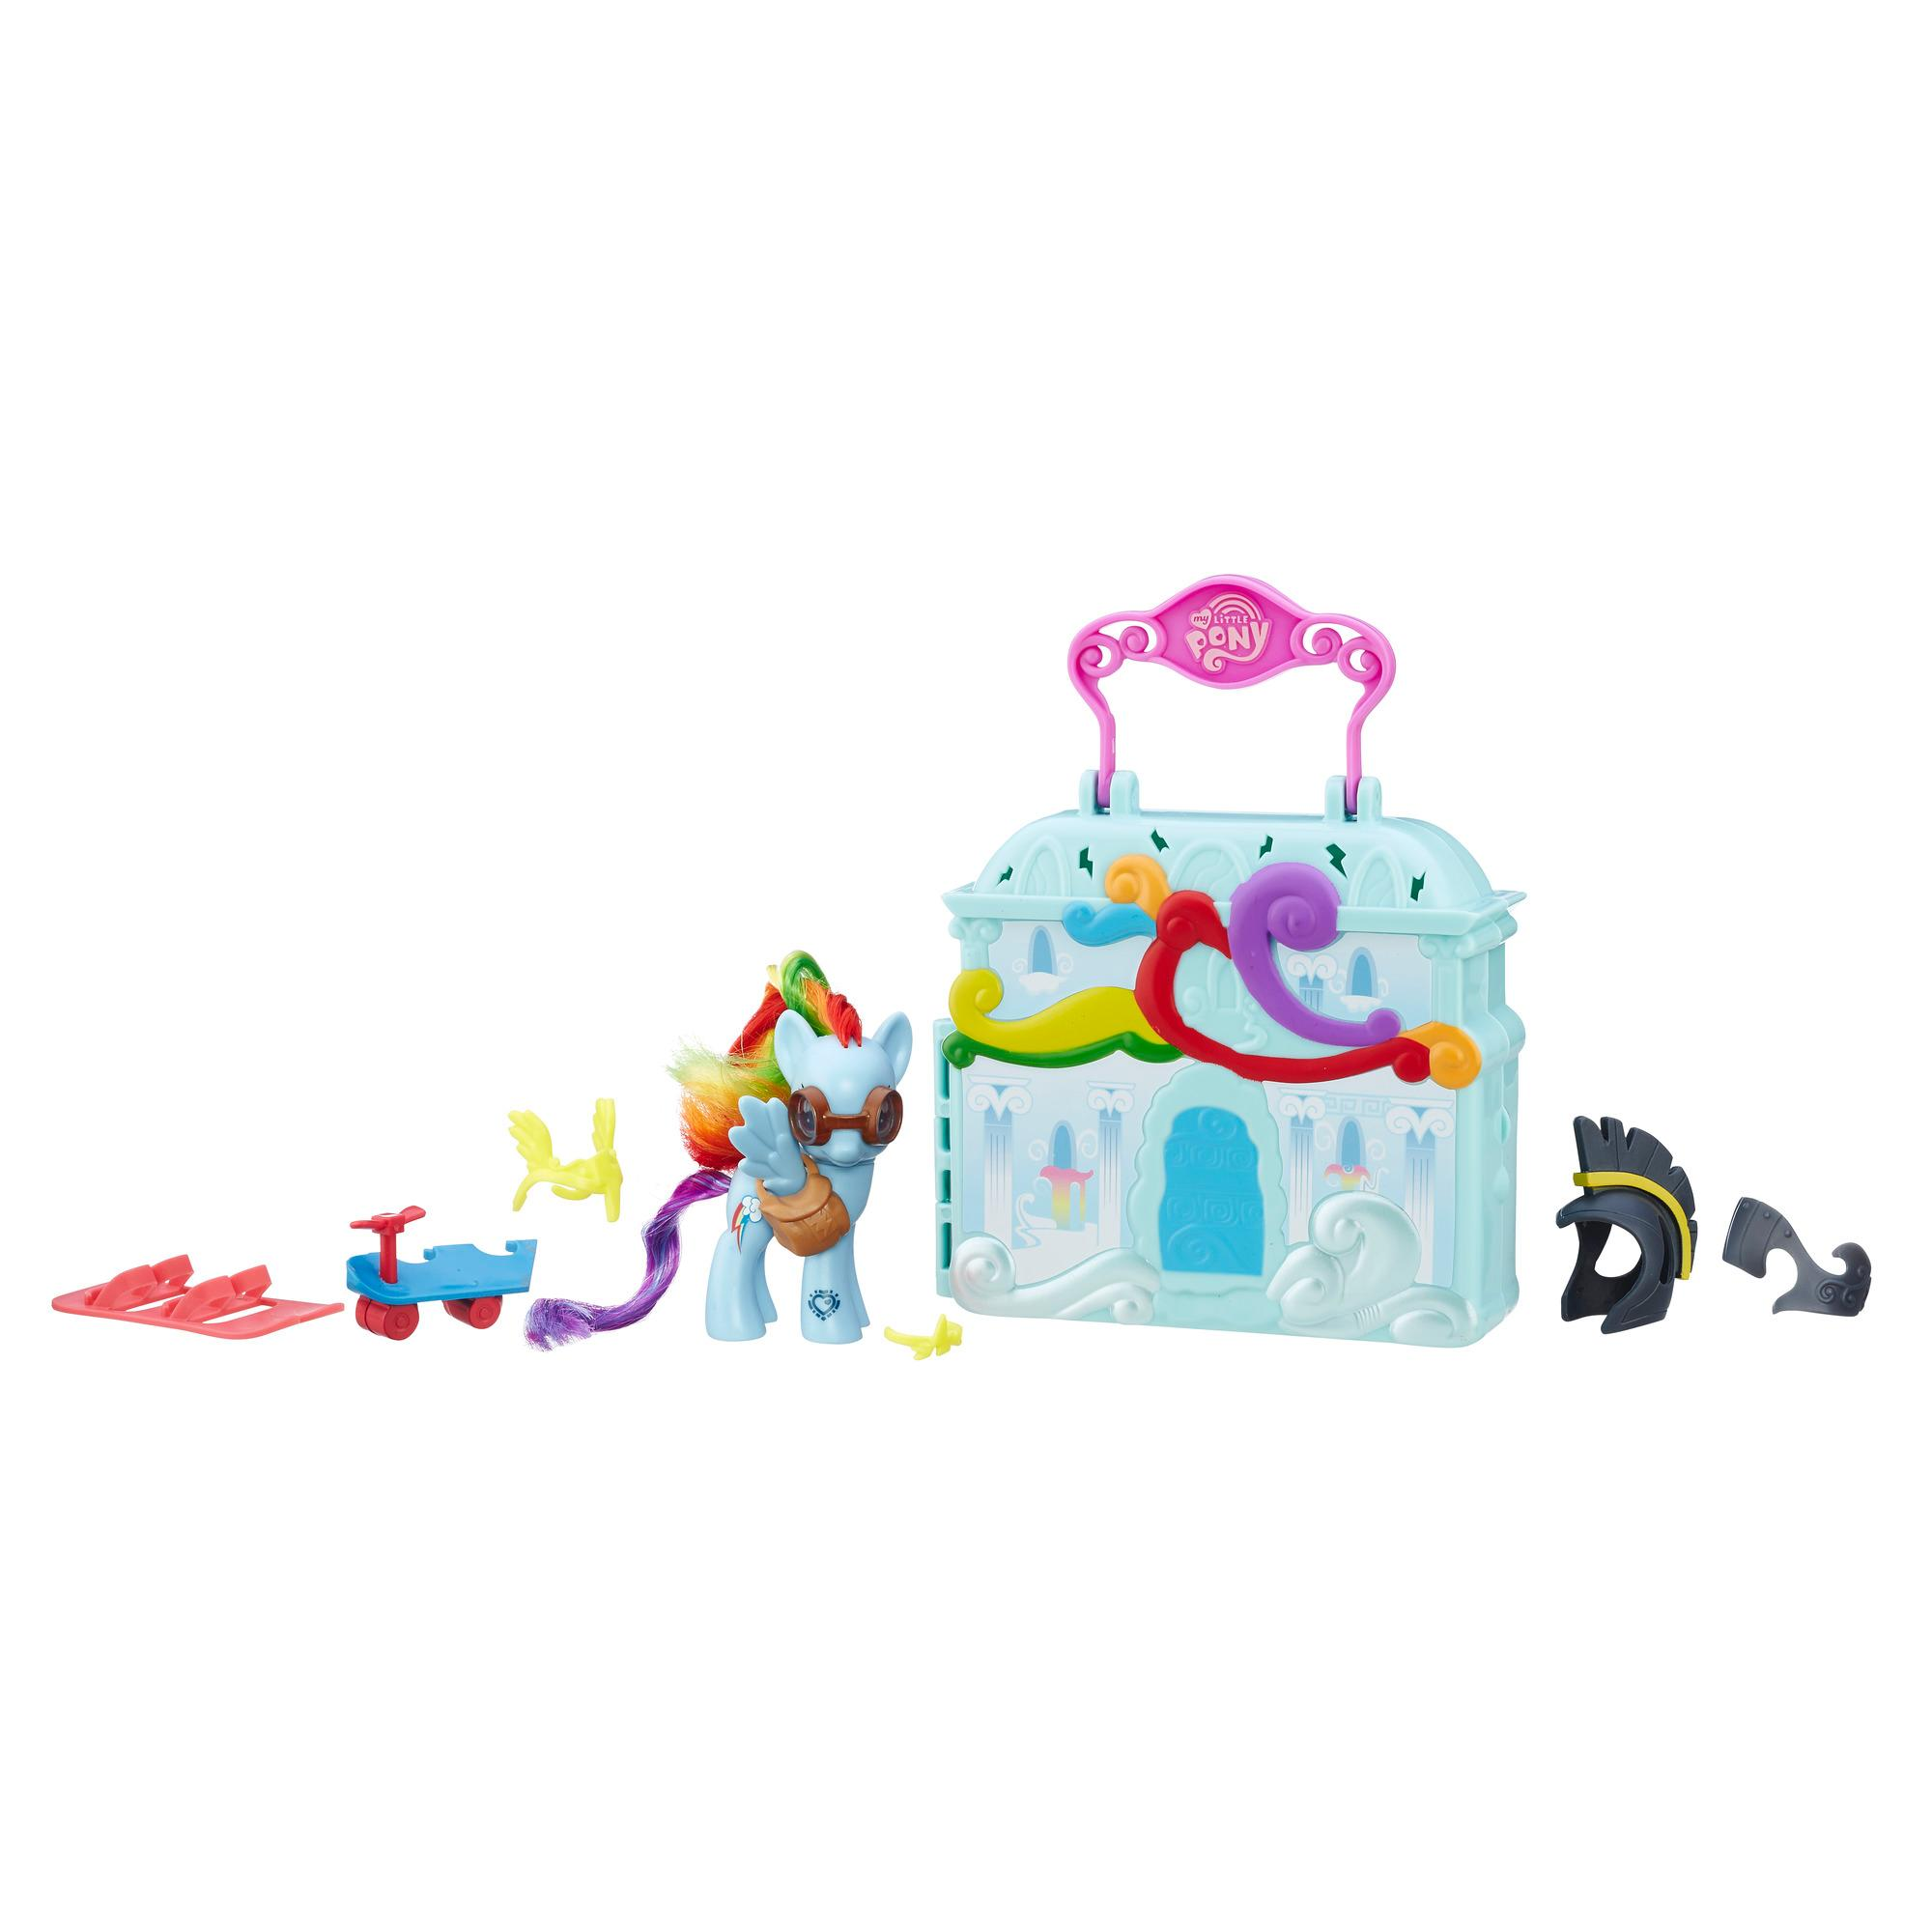 Setul de joaca Rainbow Dash la Cloudominium, My Little Pony, Friendship is magic